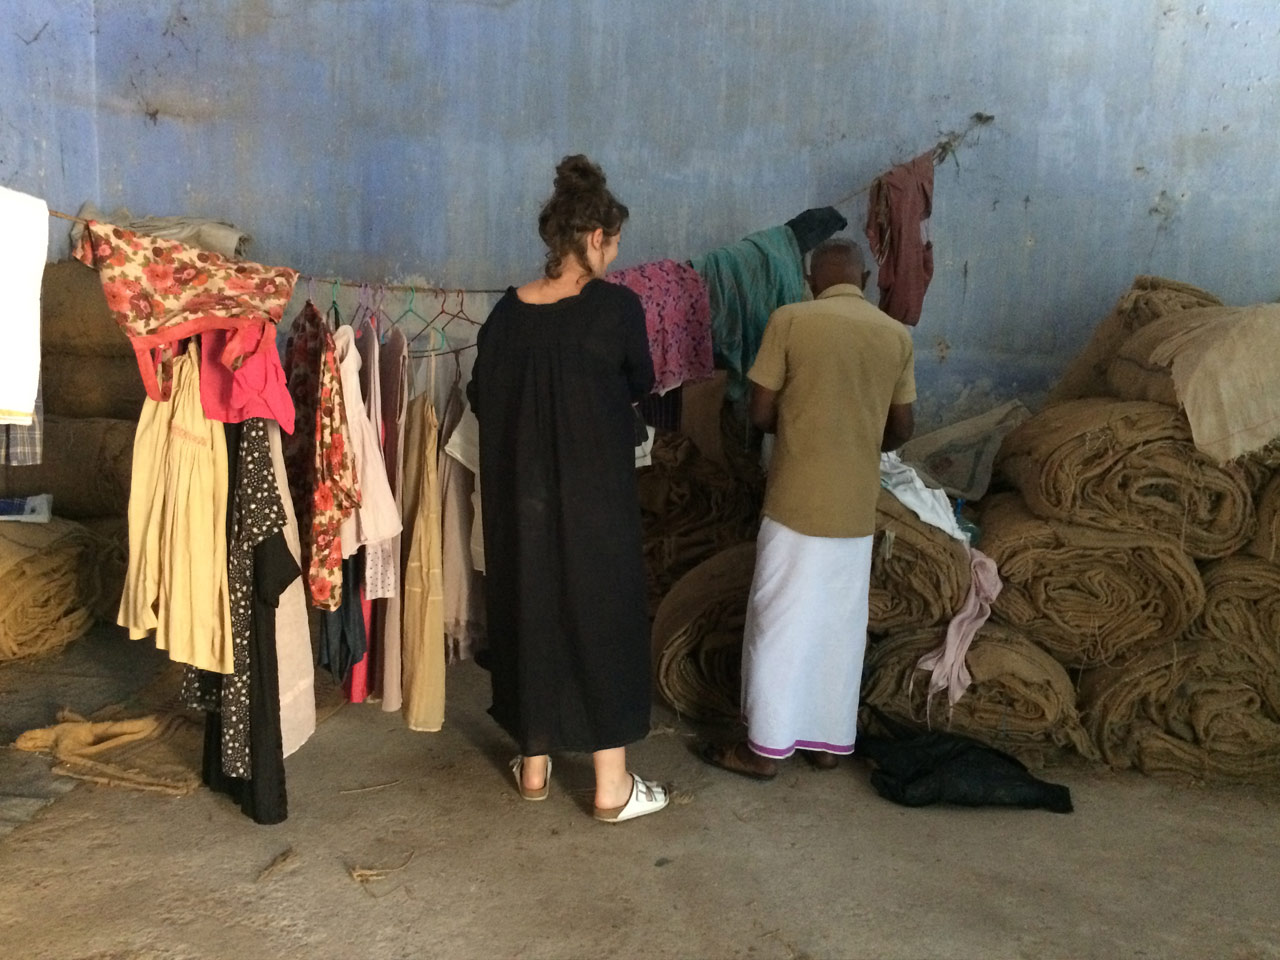 Yaya-and-Alson-Hanging-clothes